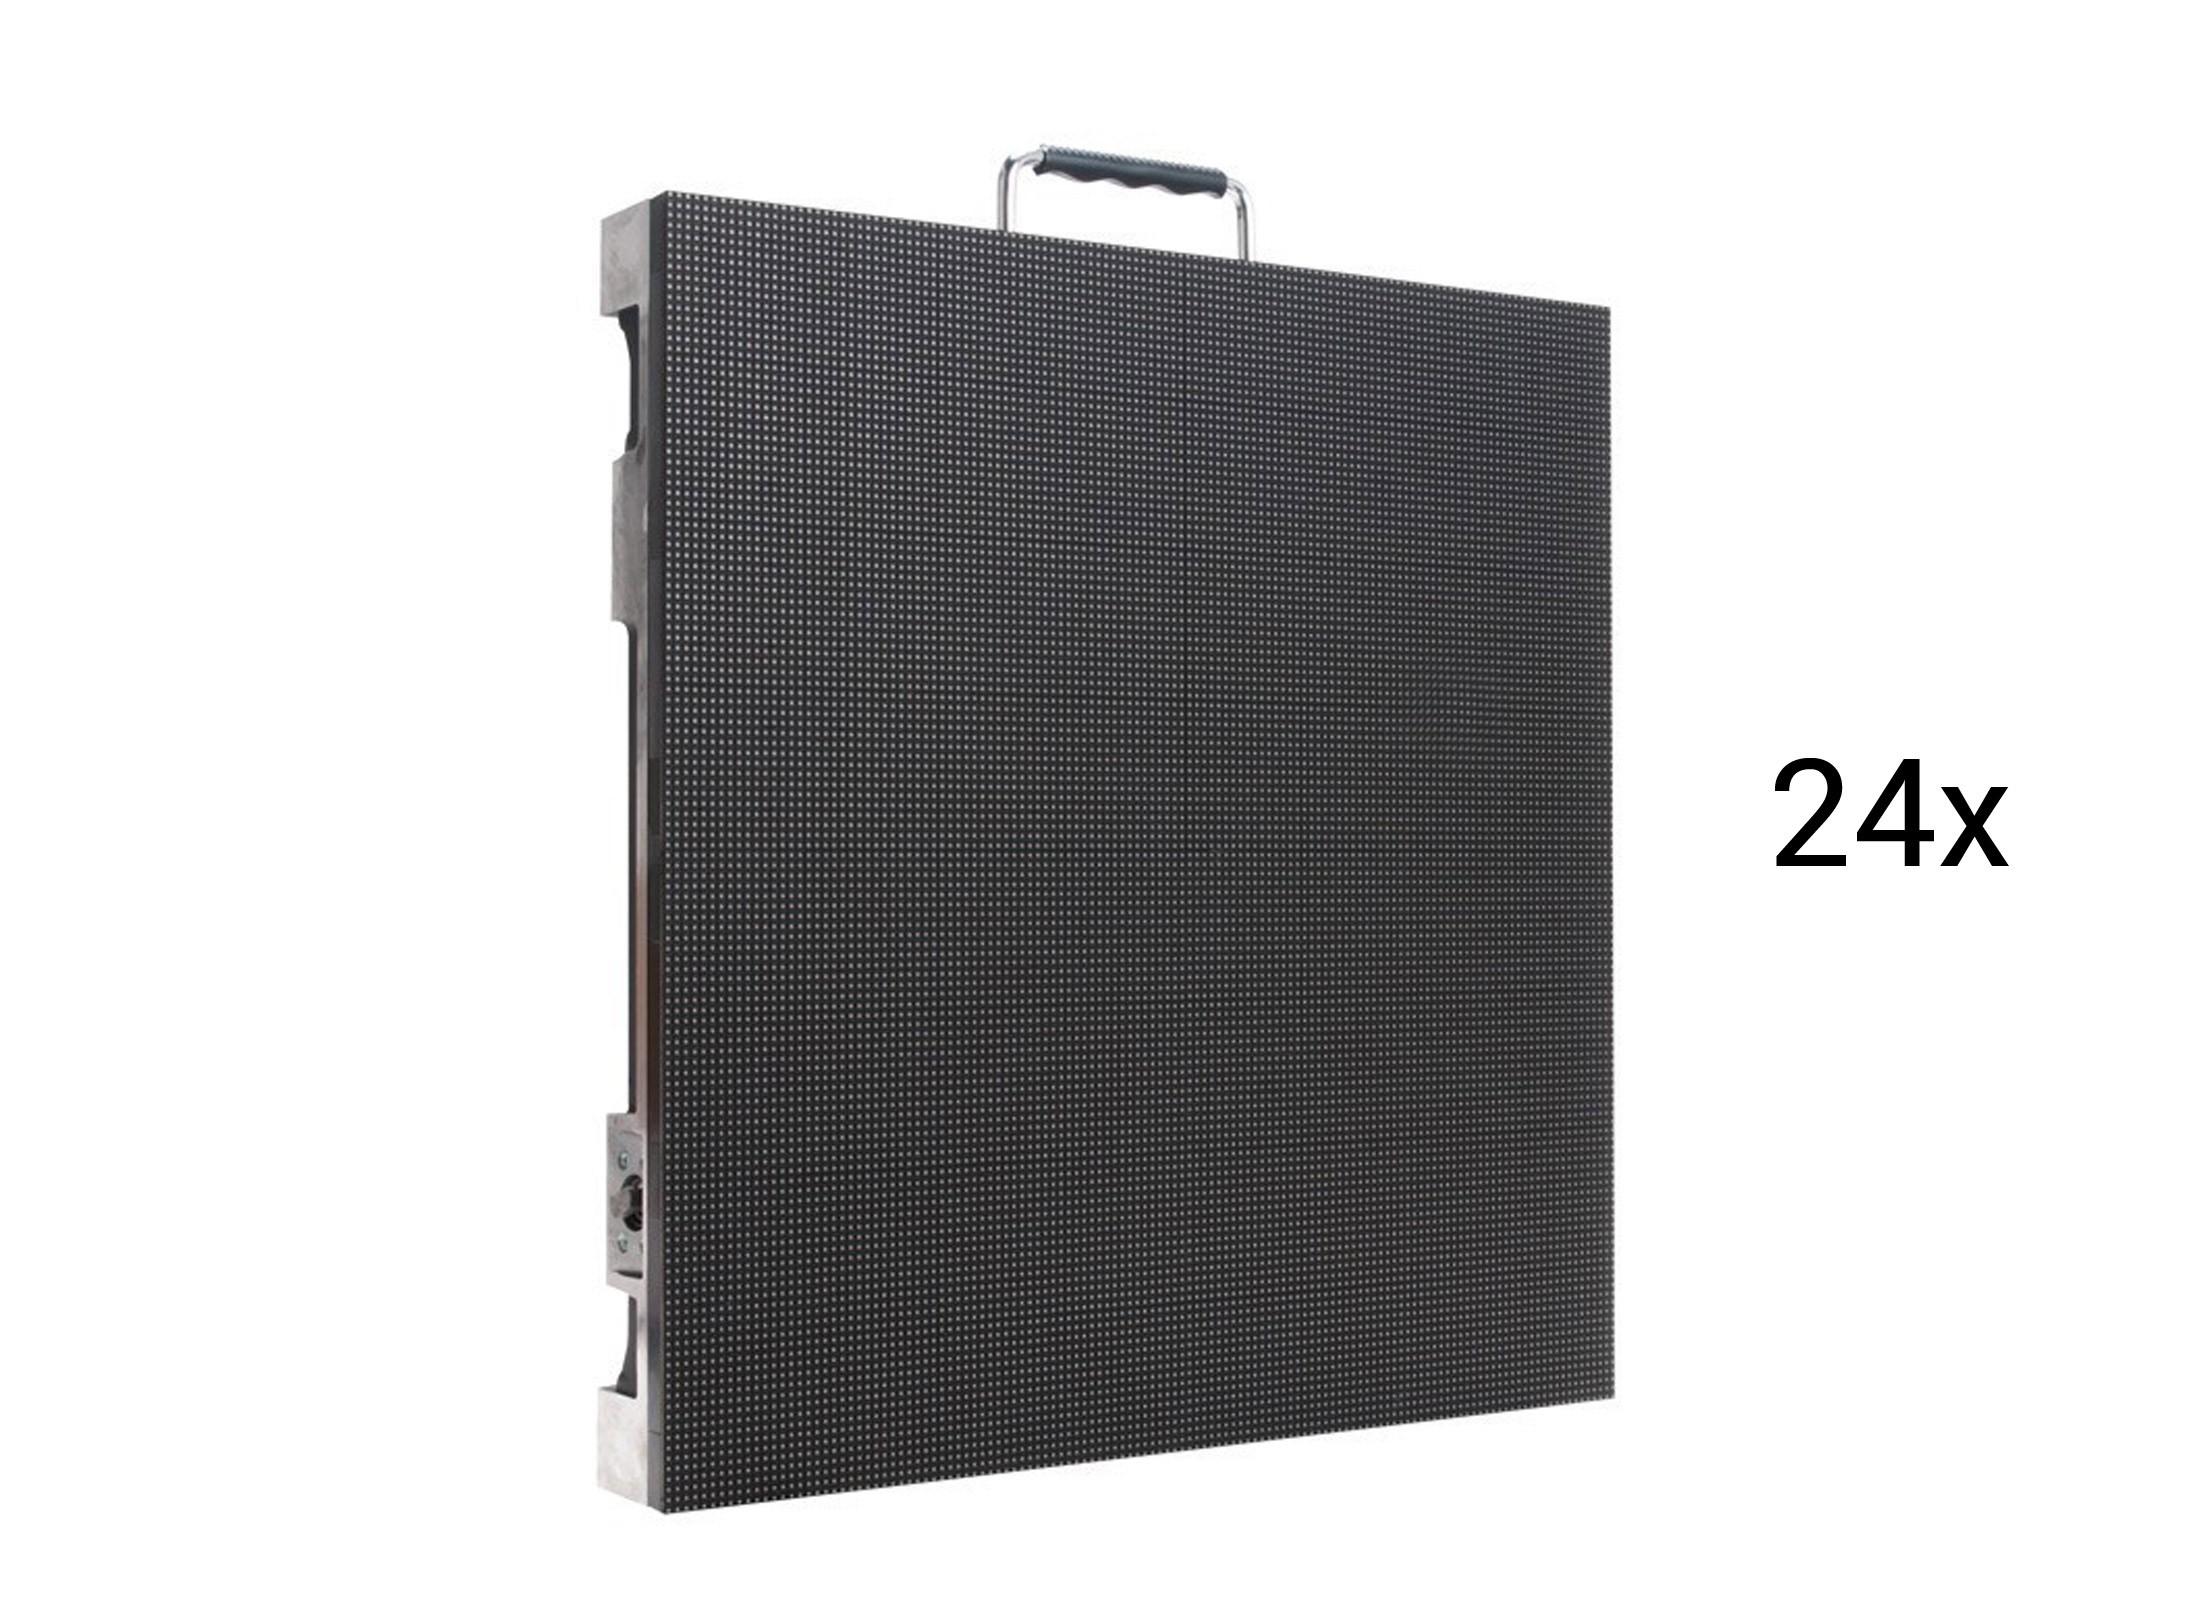 american dj av3 indoor led wall 3x2m set g nstig online kaufen bei huss licht ton. Black Bedroom Furniture Sets. Home Design Ideas